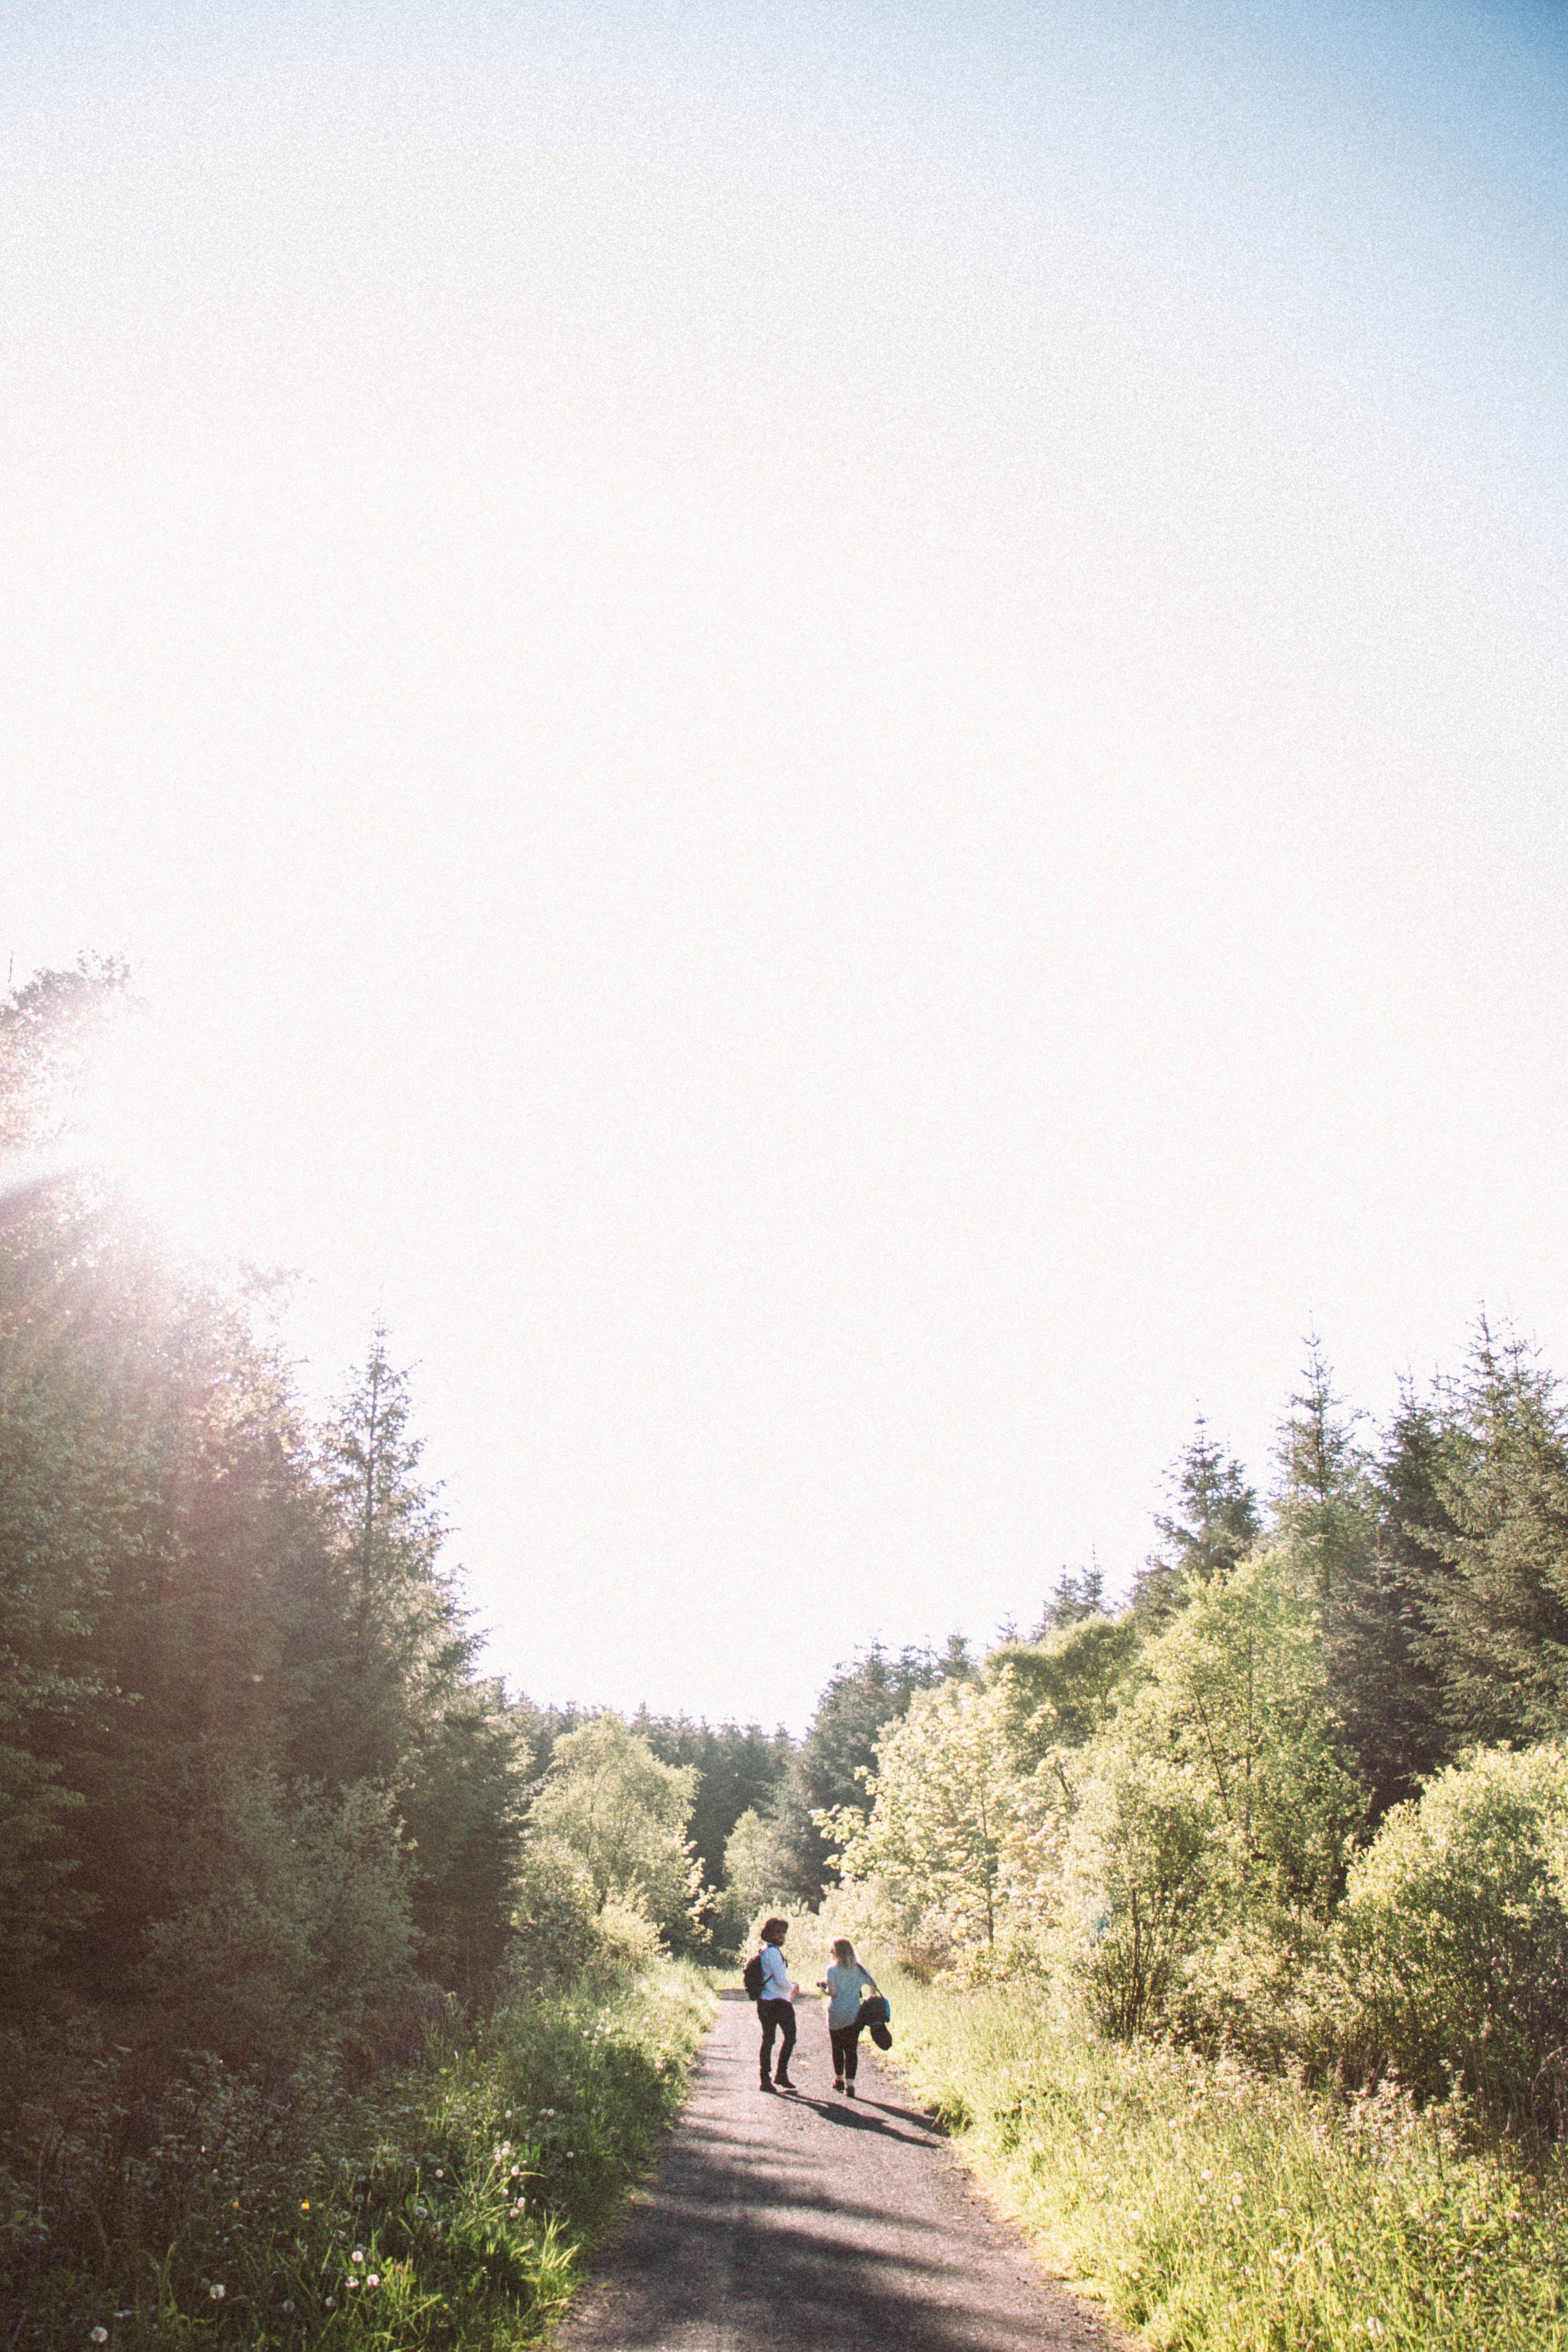 Free stock photo of adventure, explore, exploring, forest